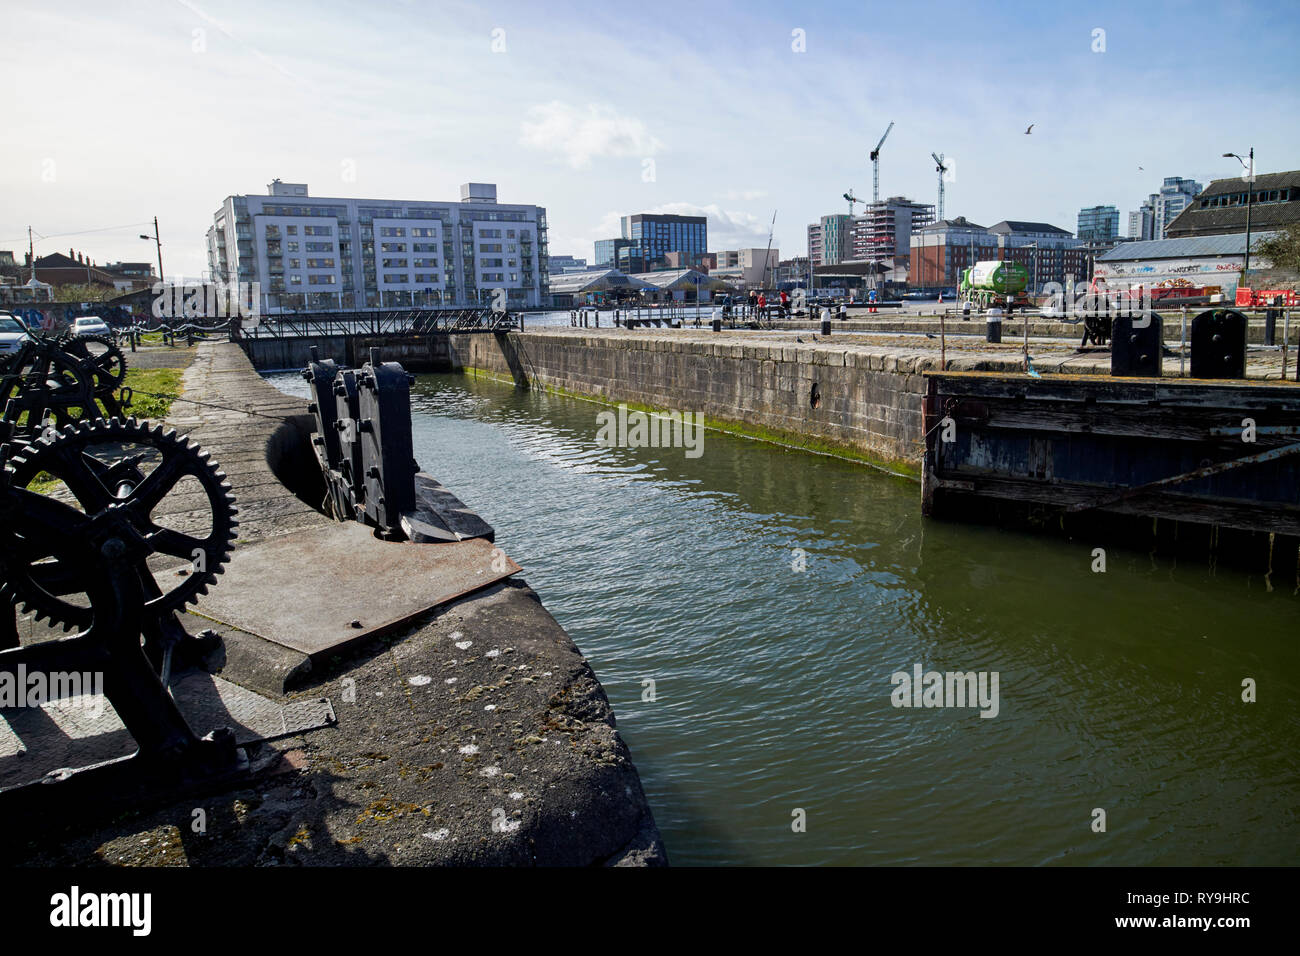 Camden Lock built in 1790 part of the grand canal docks lock gates Dublin Republic of Ireland Europe - Stock Image